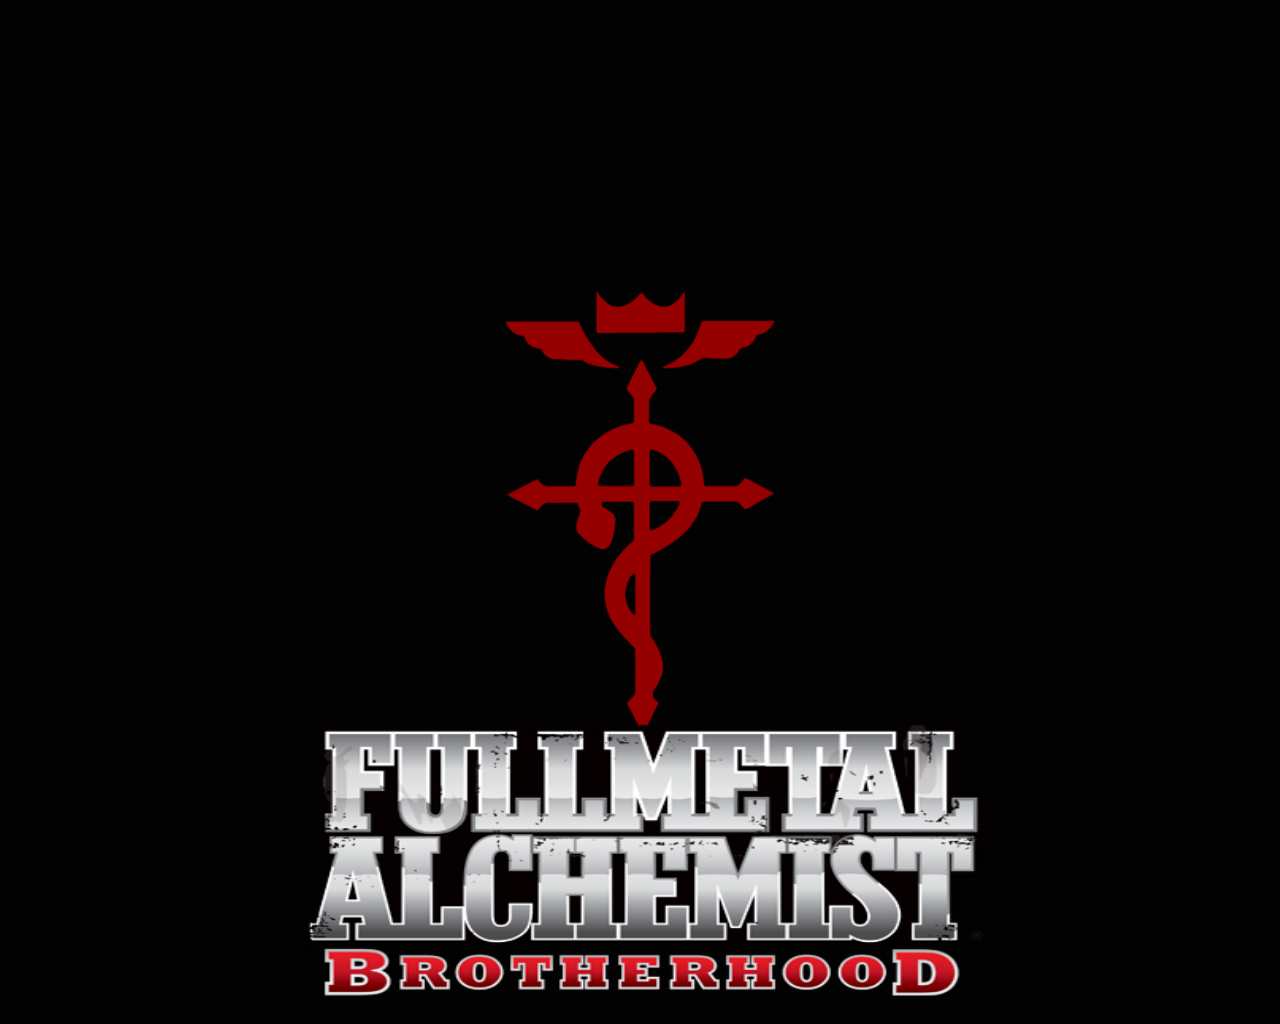 fullmetal alchemist brotherhood ost - hum of the streets